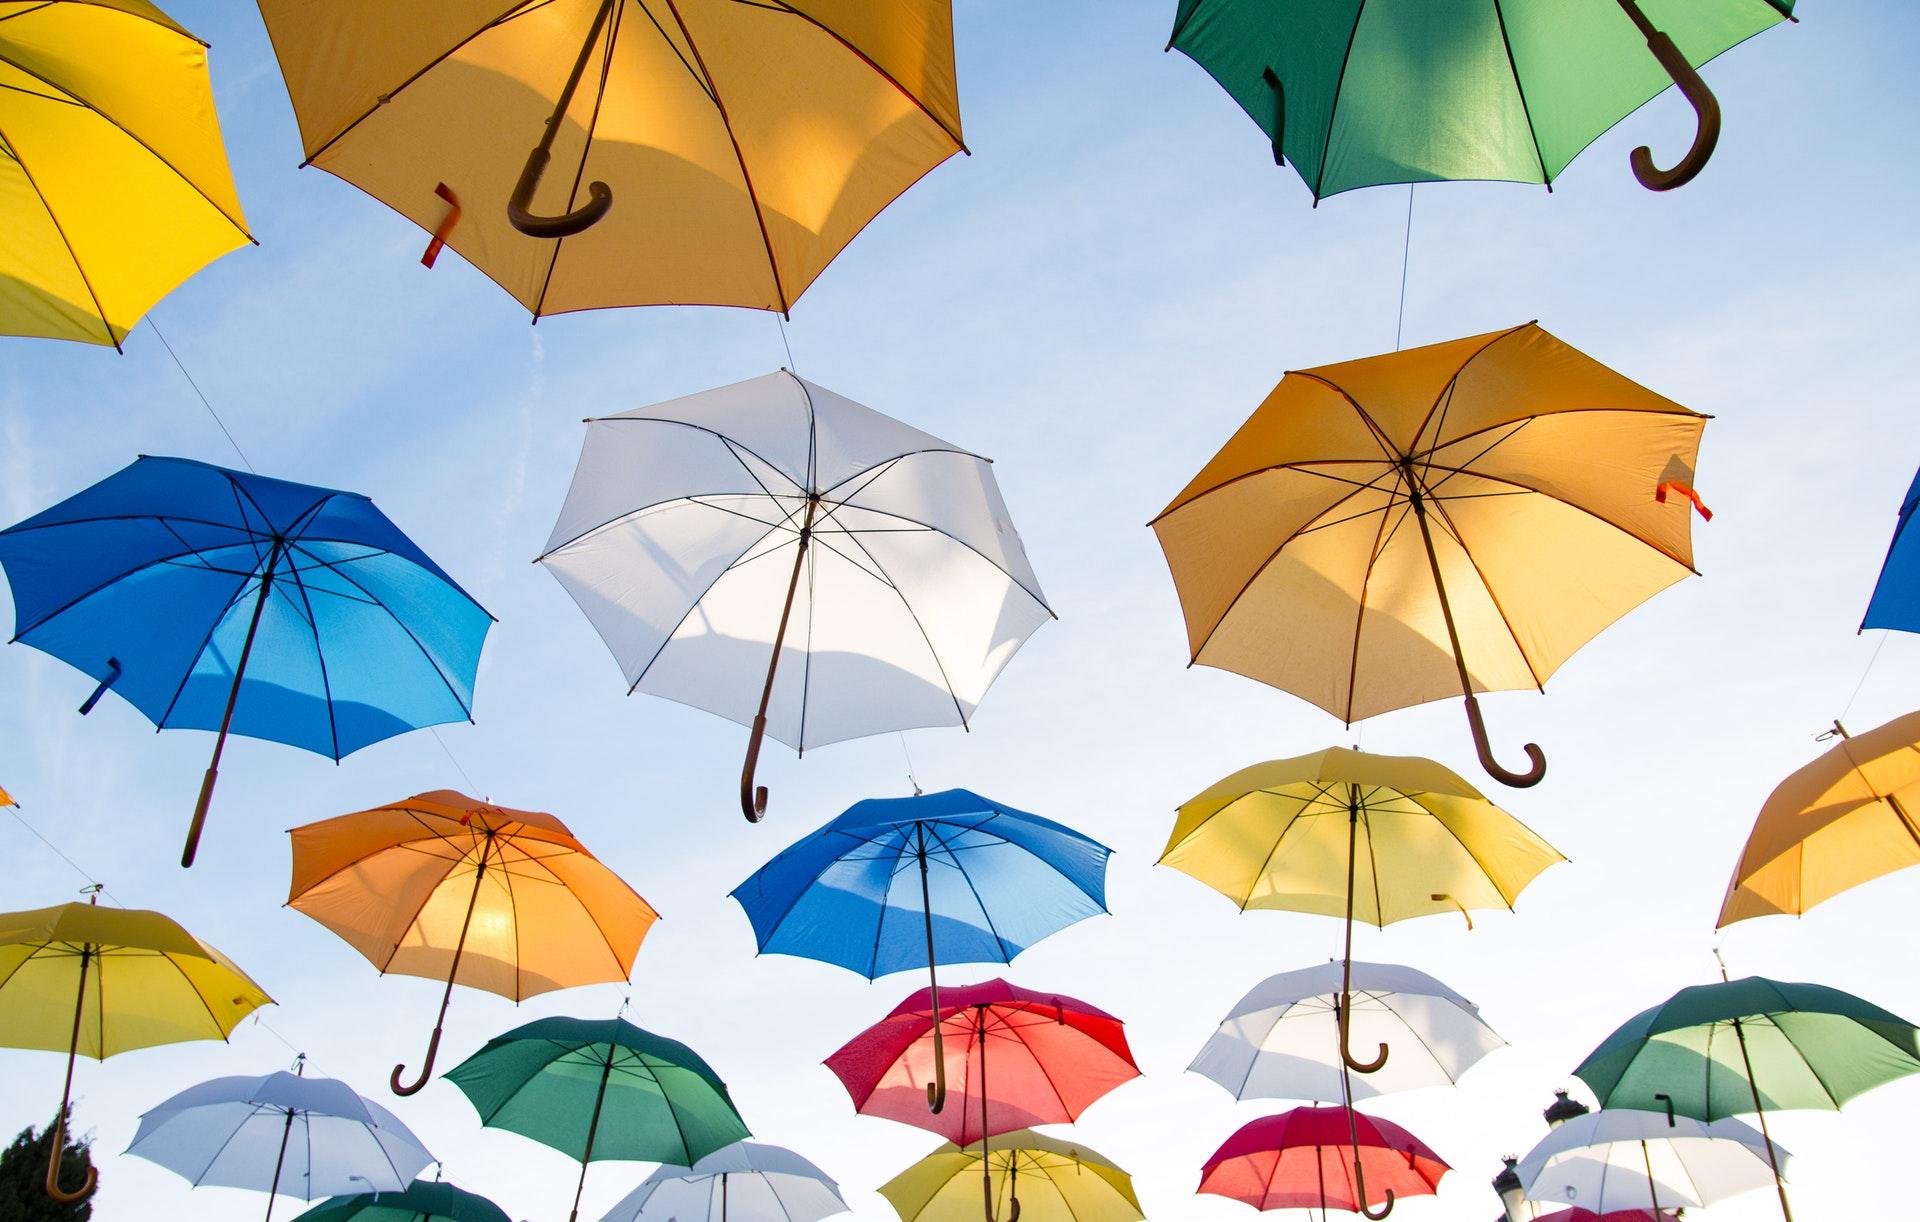 download wallpaper: gekleurde paraplu's wallpaper